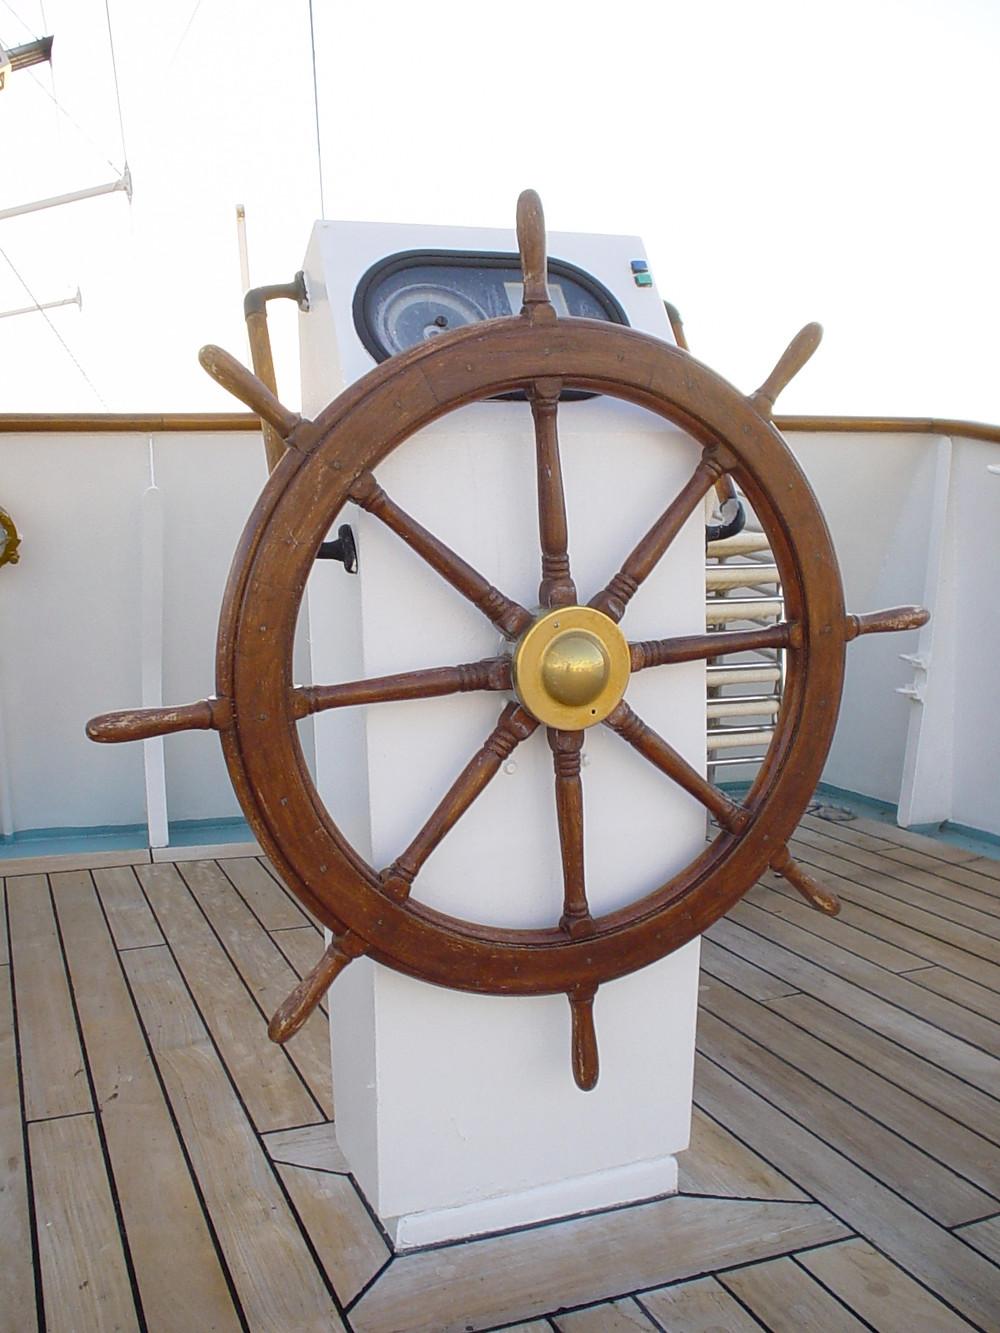 Windstar Spirit ship's steering wheel